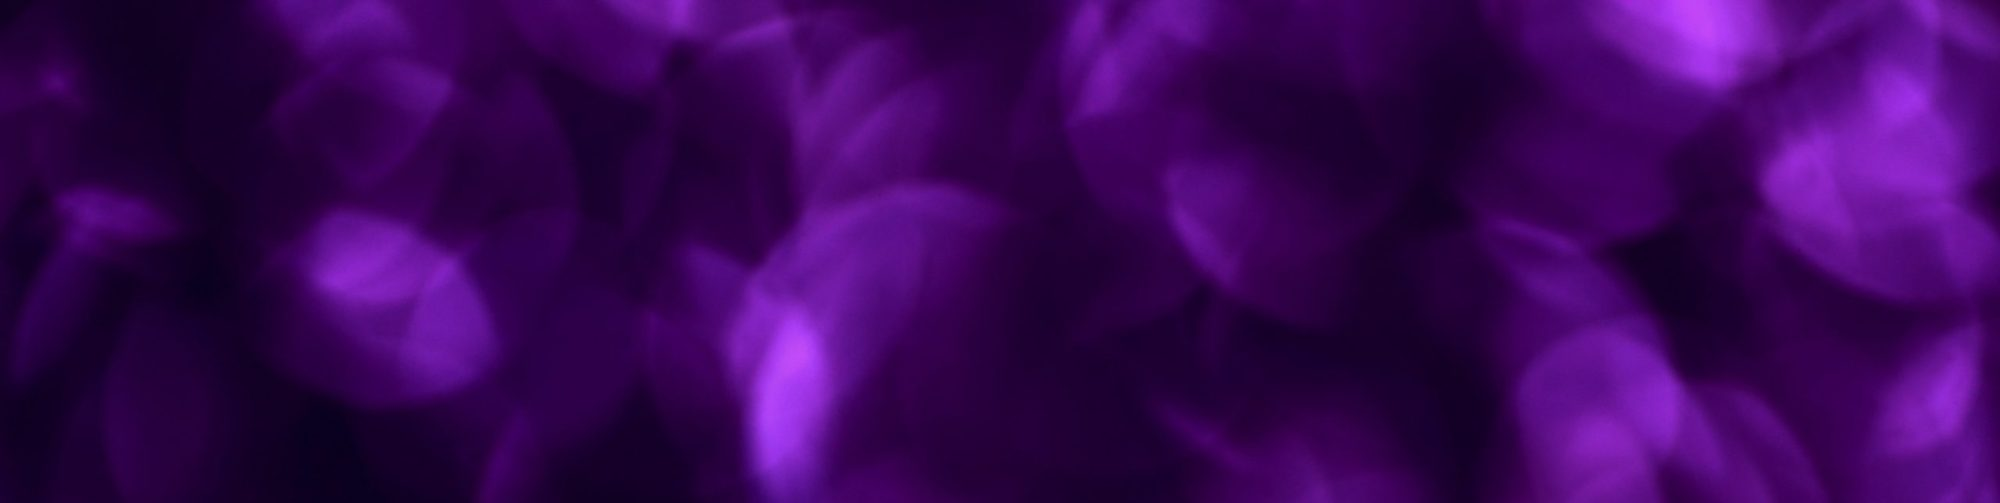 my purple rain